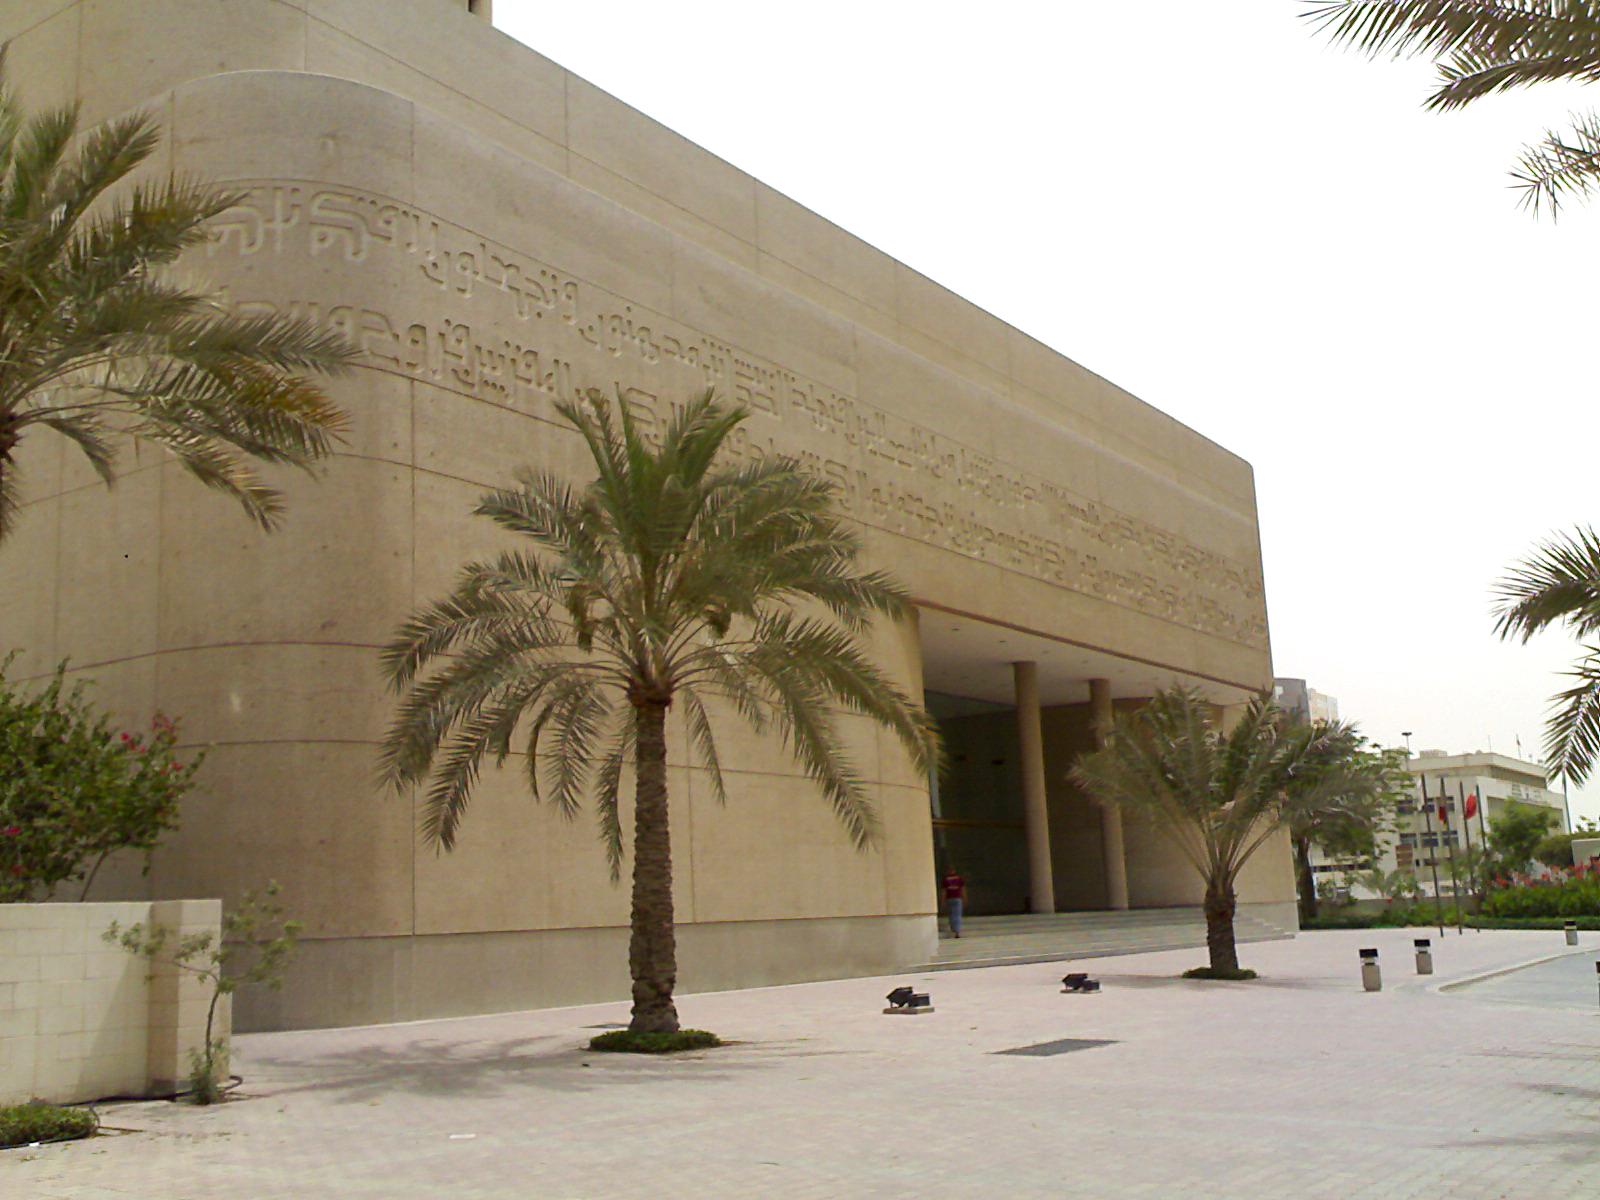 Beit Al Quran (House of theKoran)